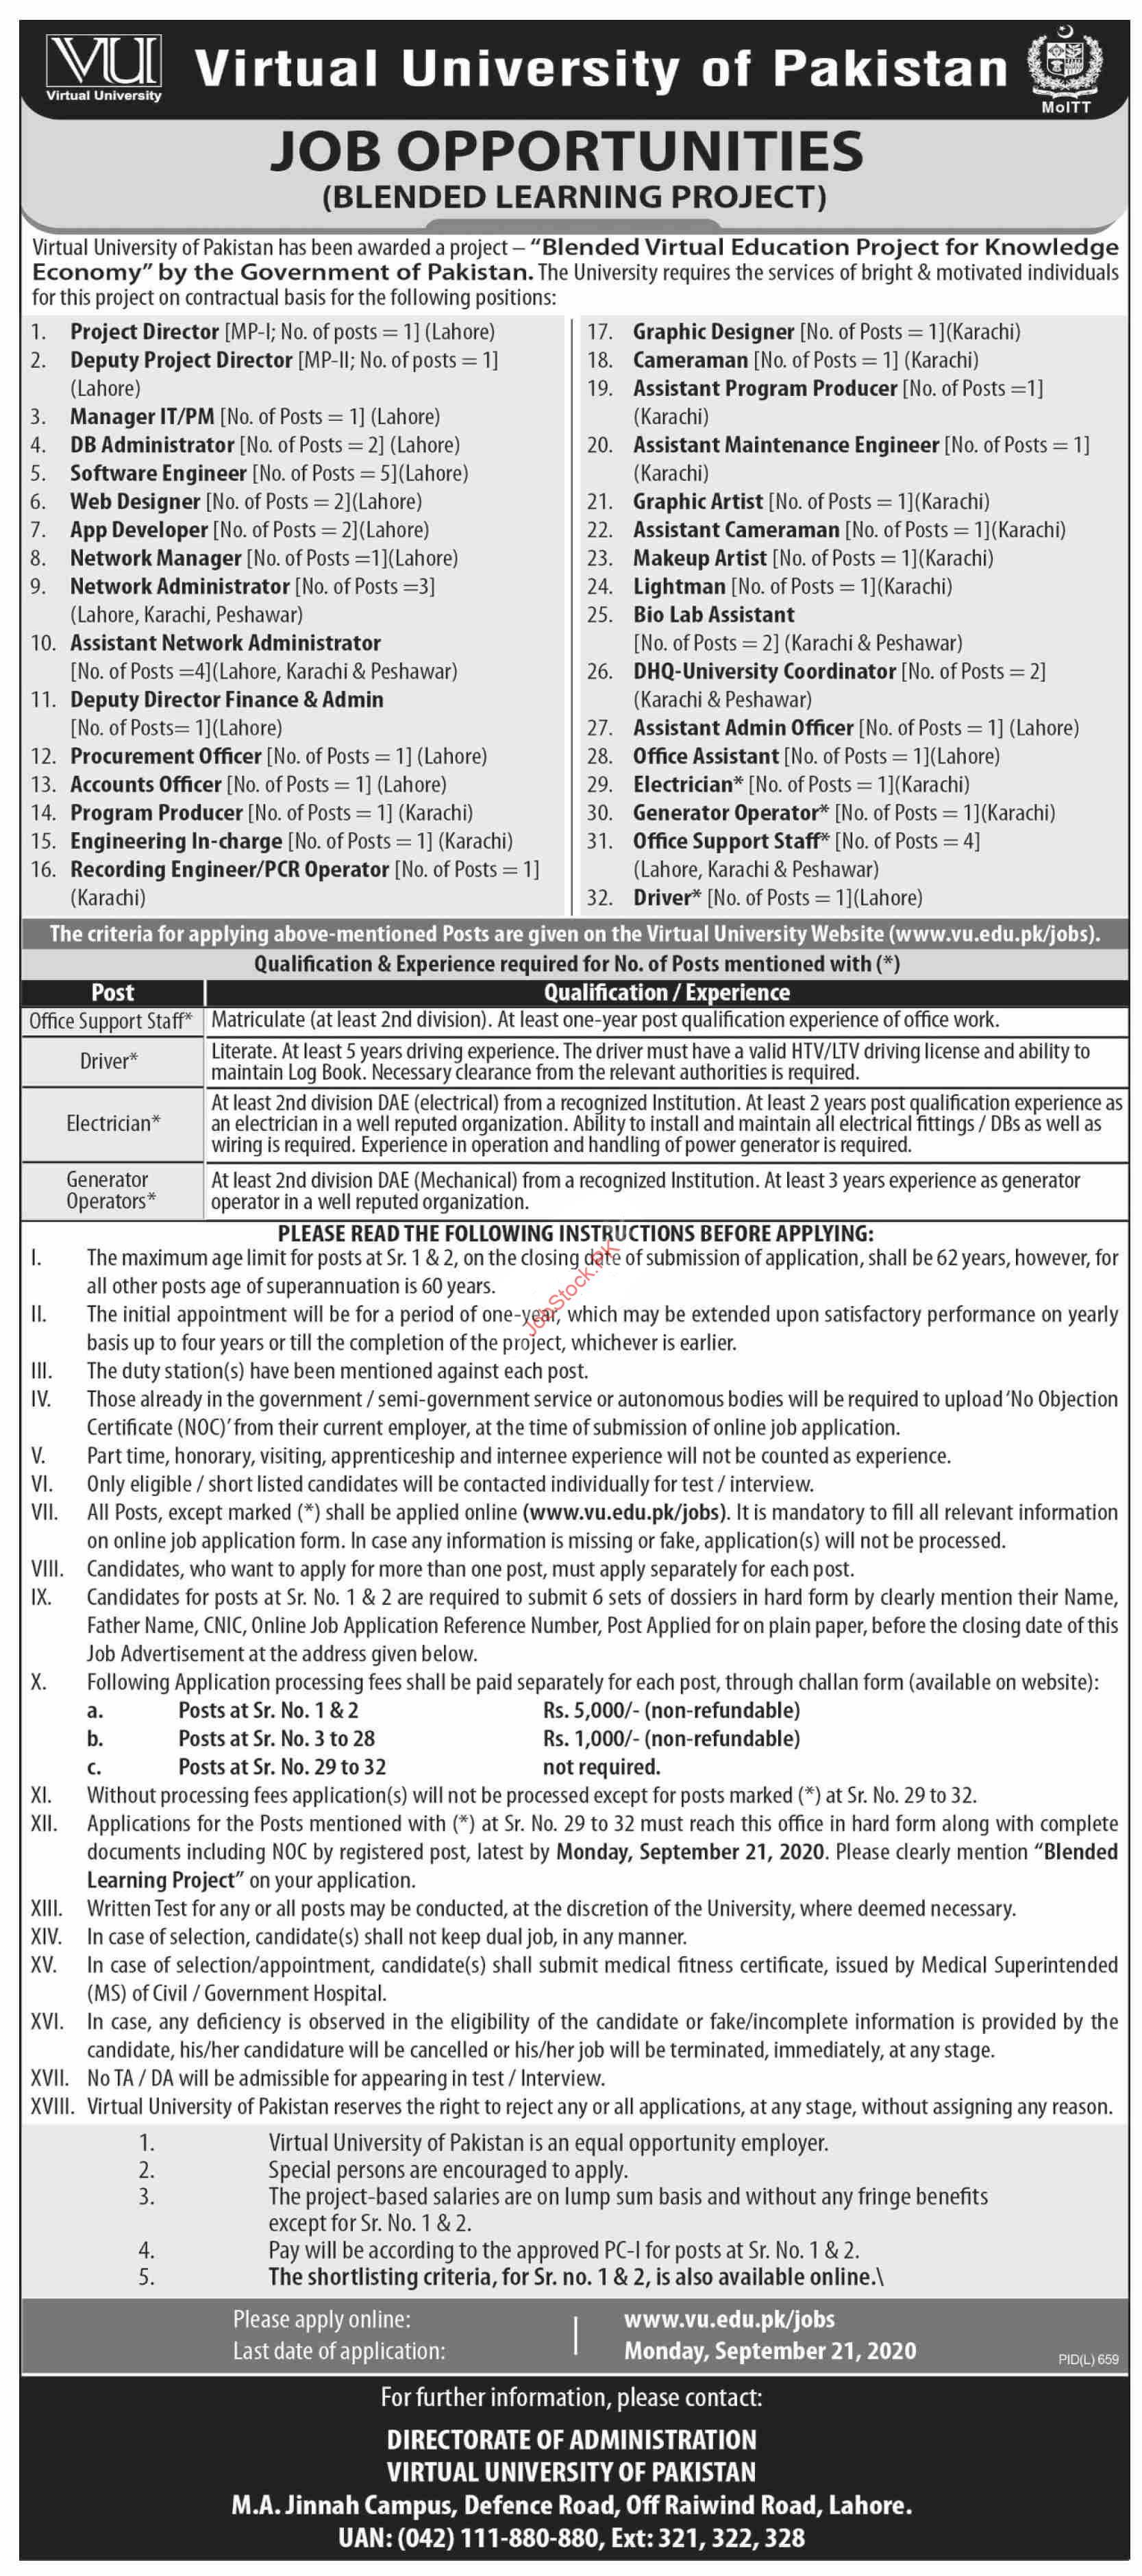 Virtual University Of Pakistan Jobs 2020